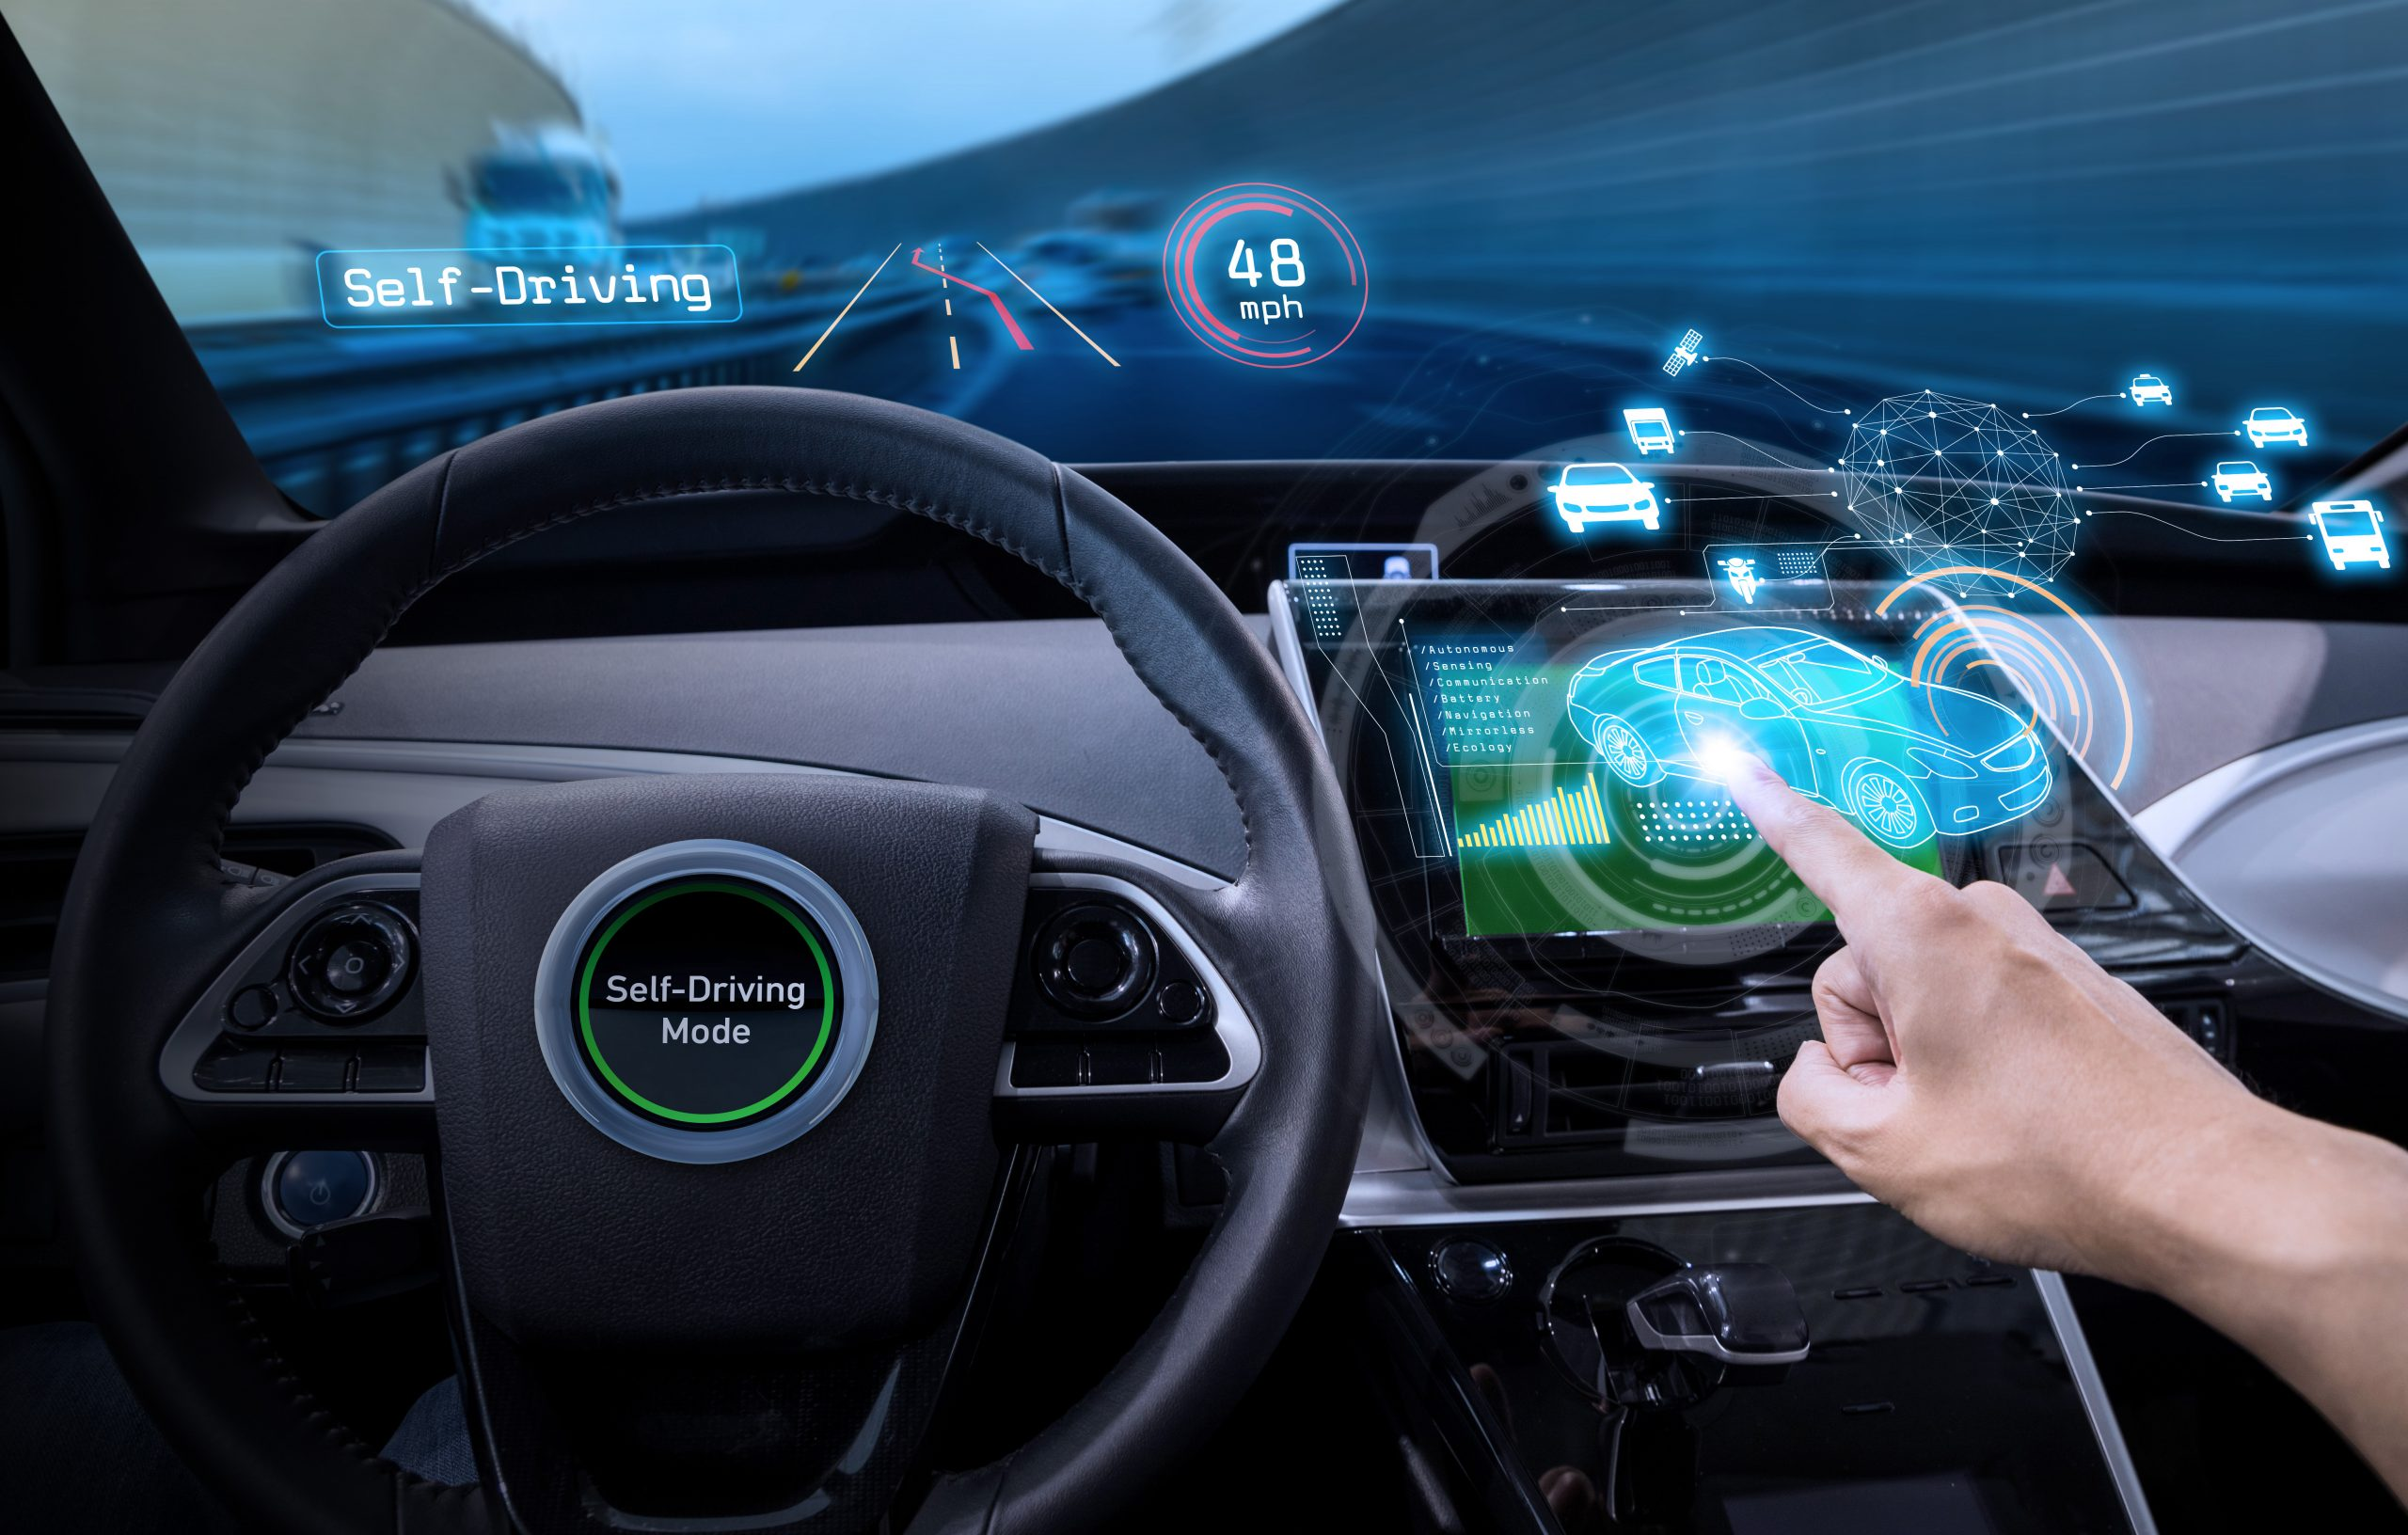 Automotive Design, Test and Simulation Solutions Market – 2019